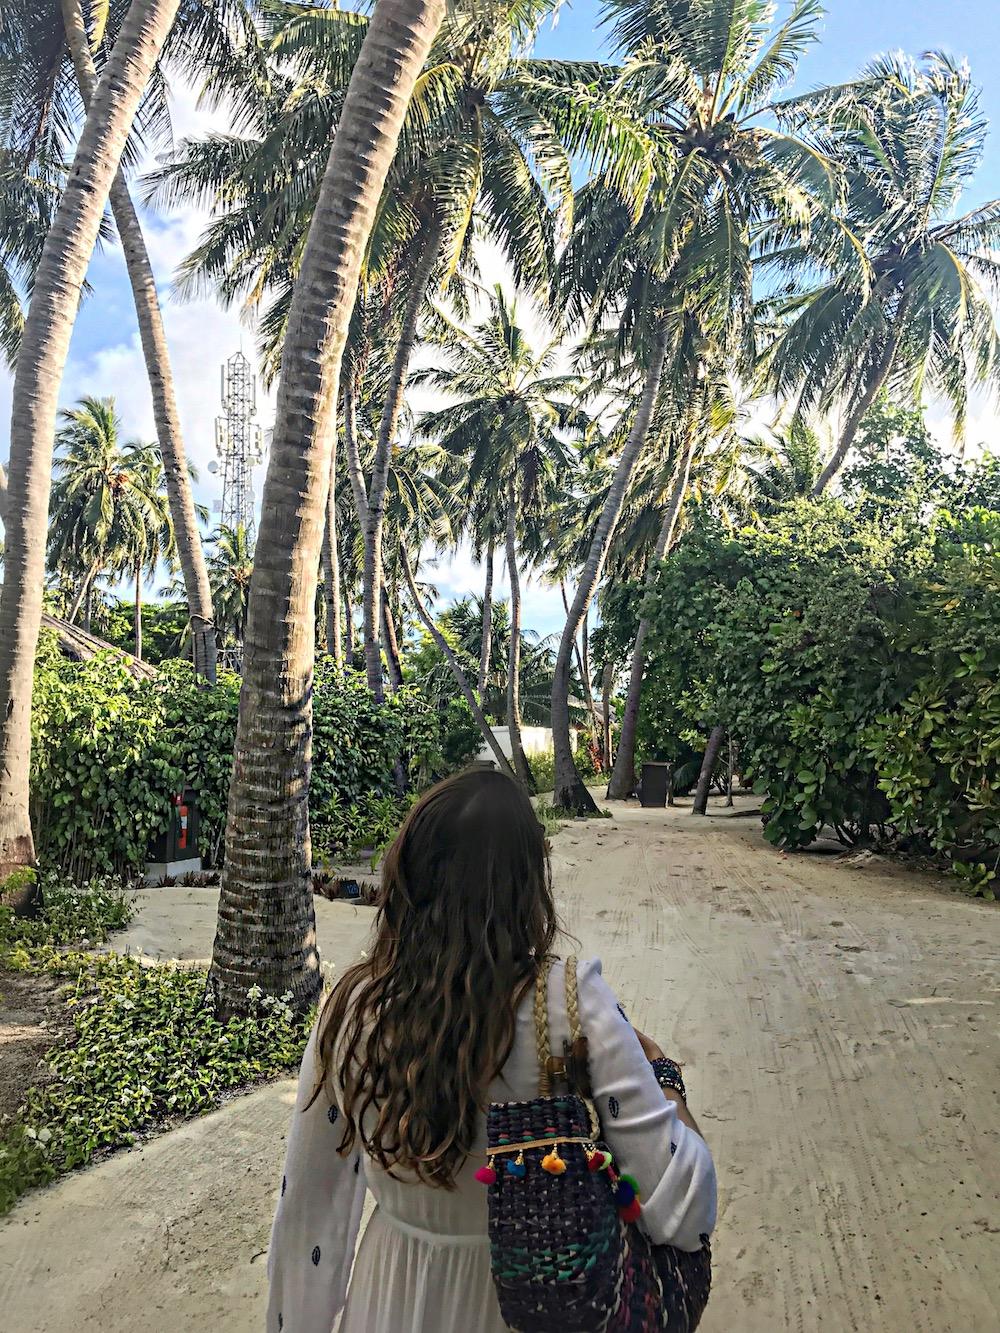 palm-trees-maldives-alley-girl-fashion-travel-life-style-blog